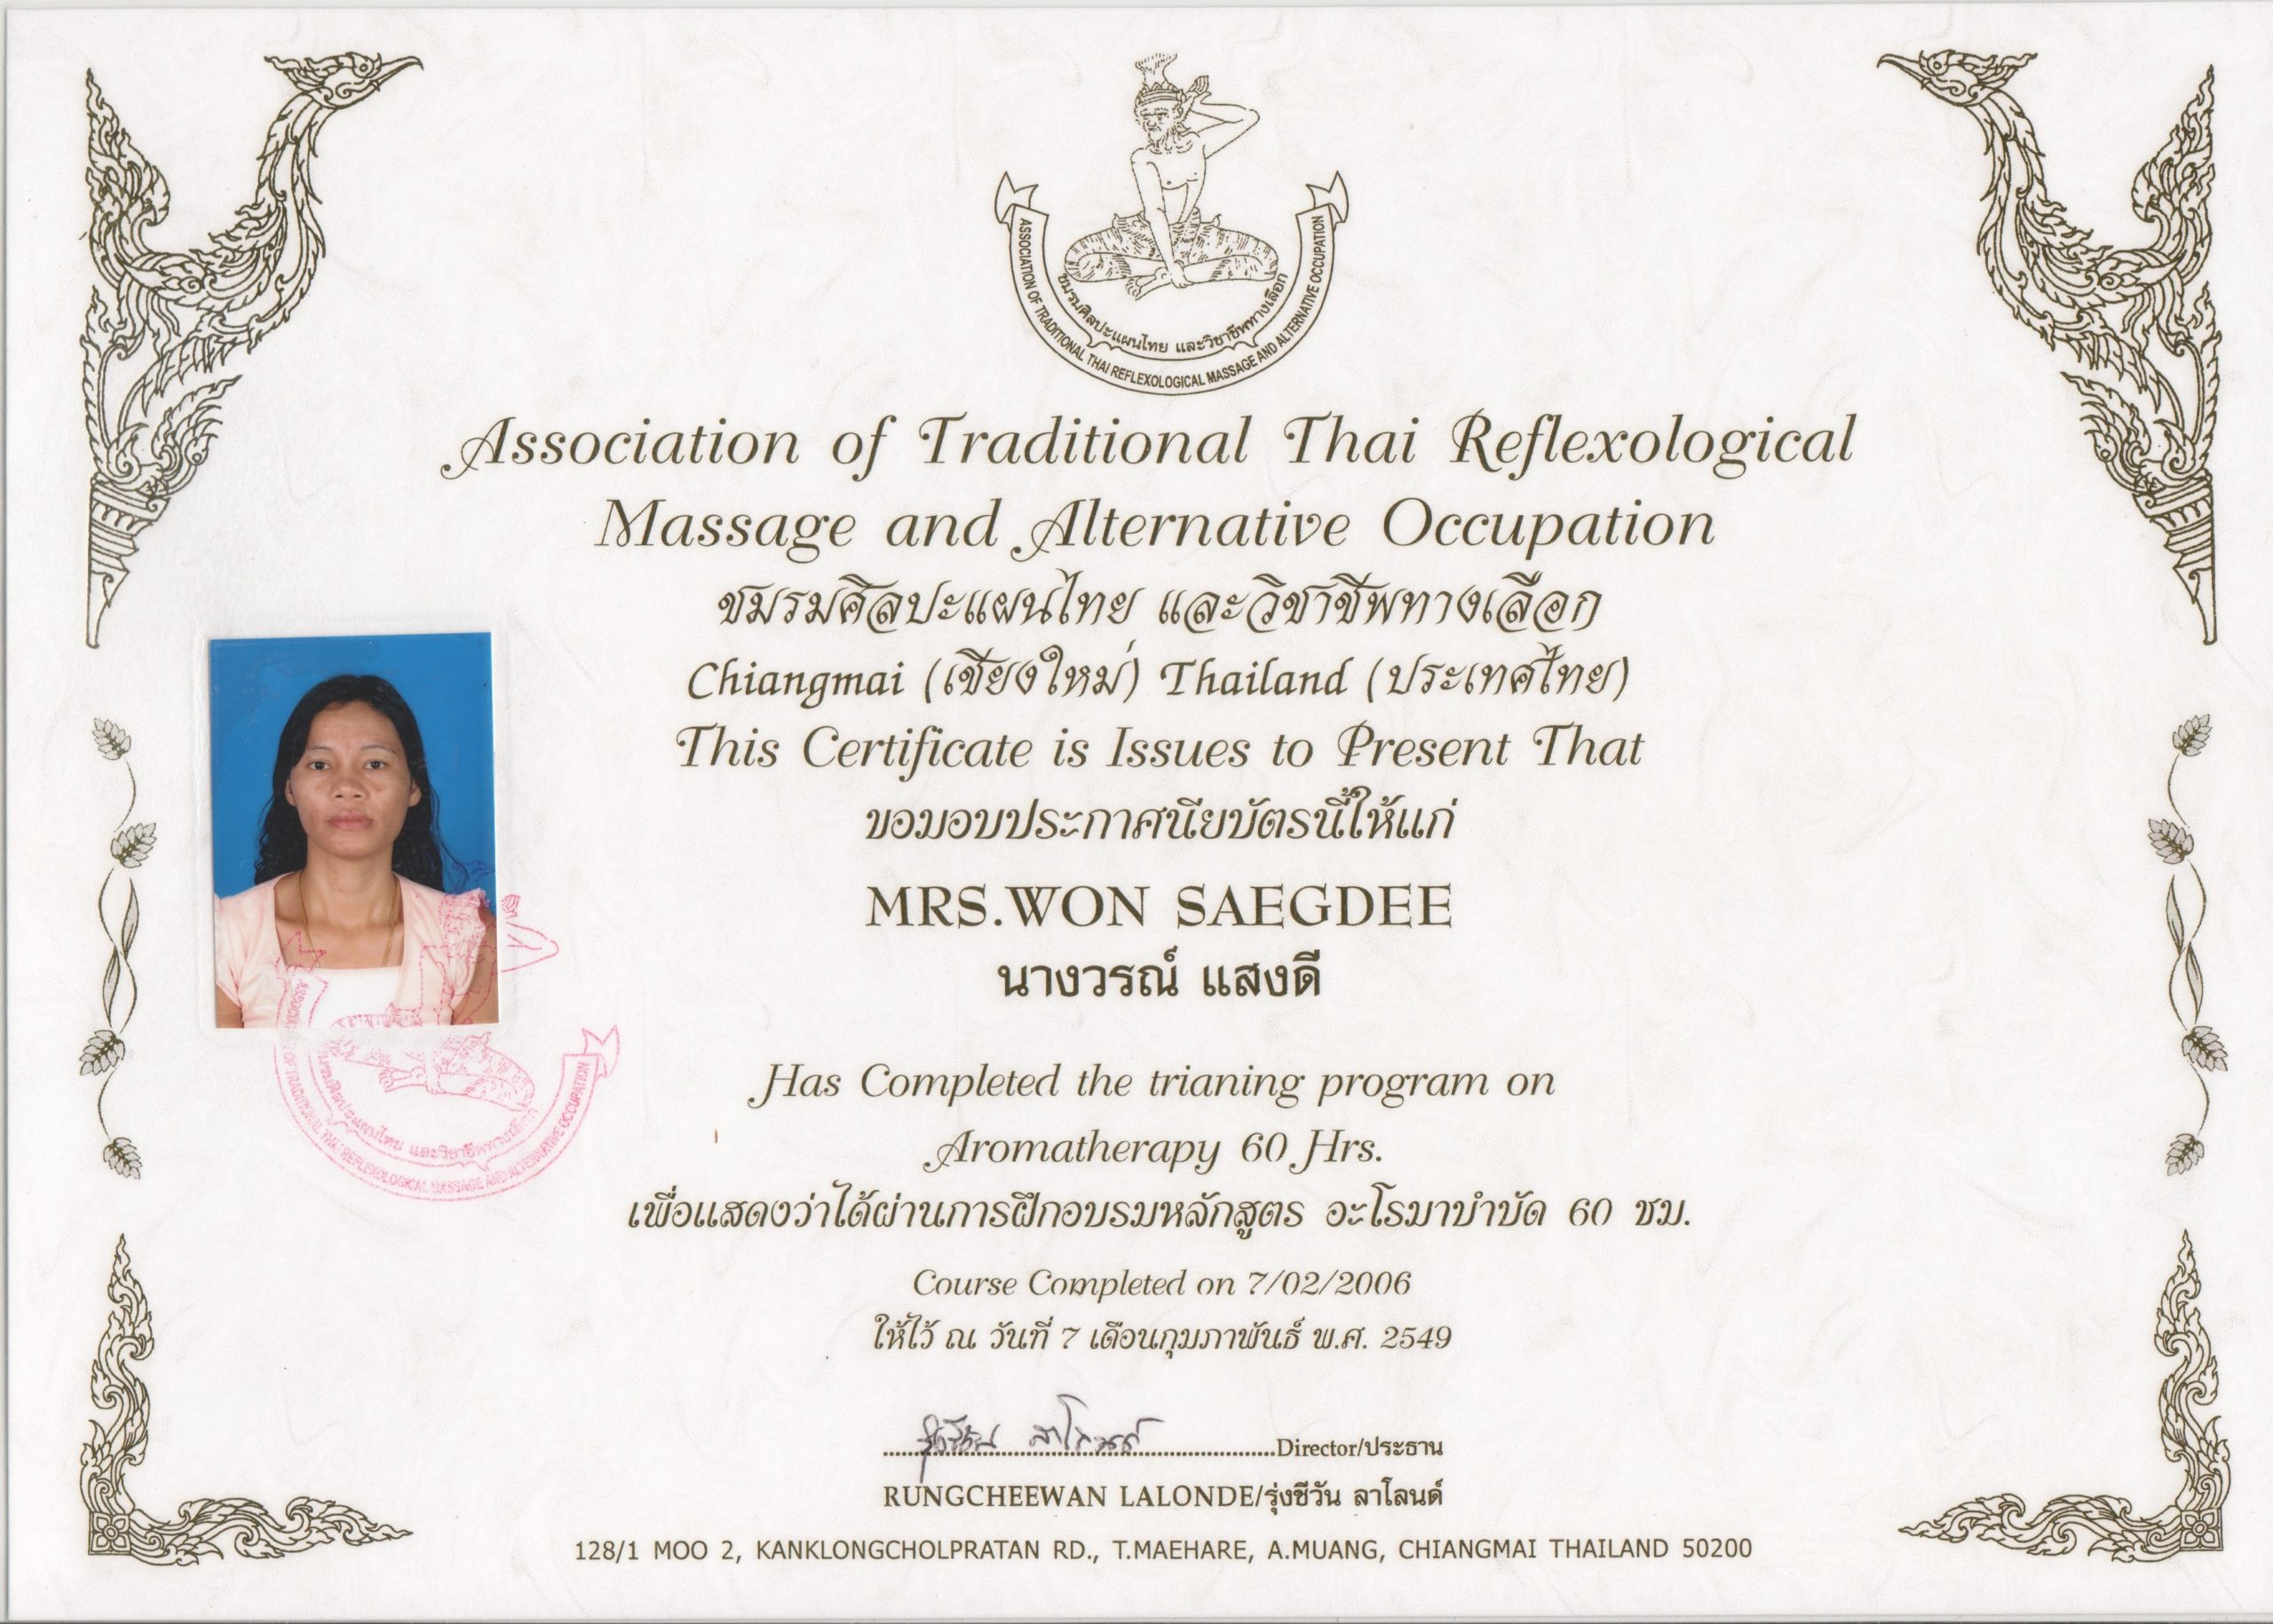 Saegdee-Thai-Massage-Zertifikate-Oel